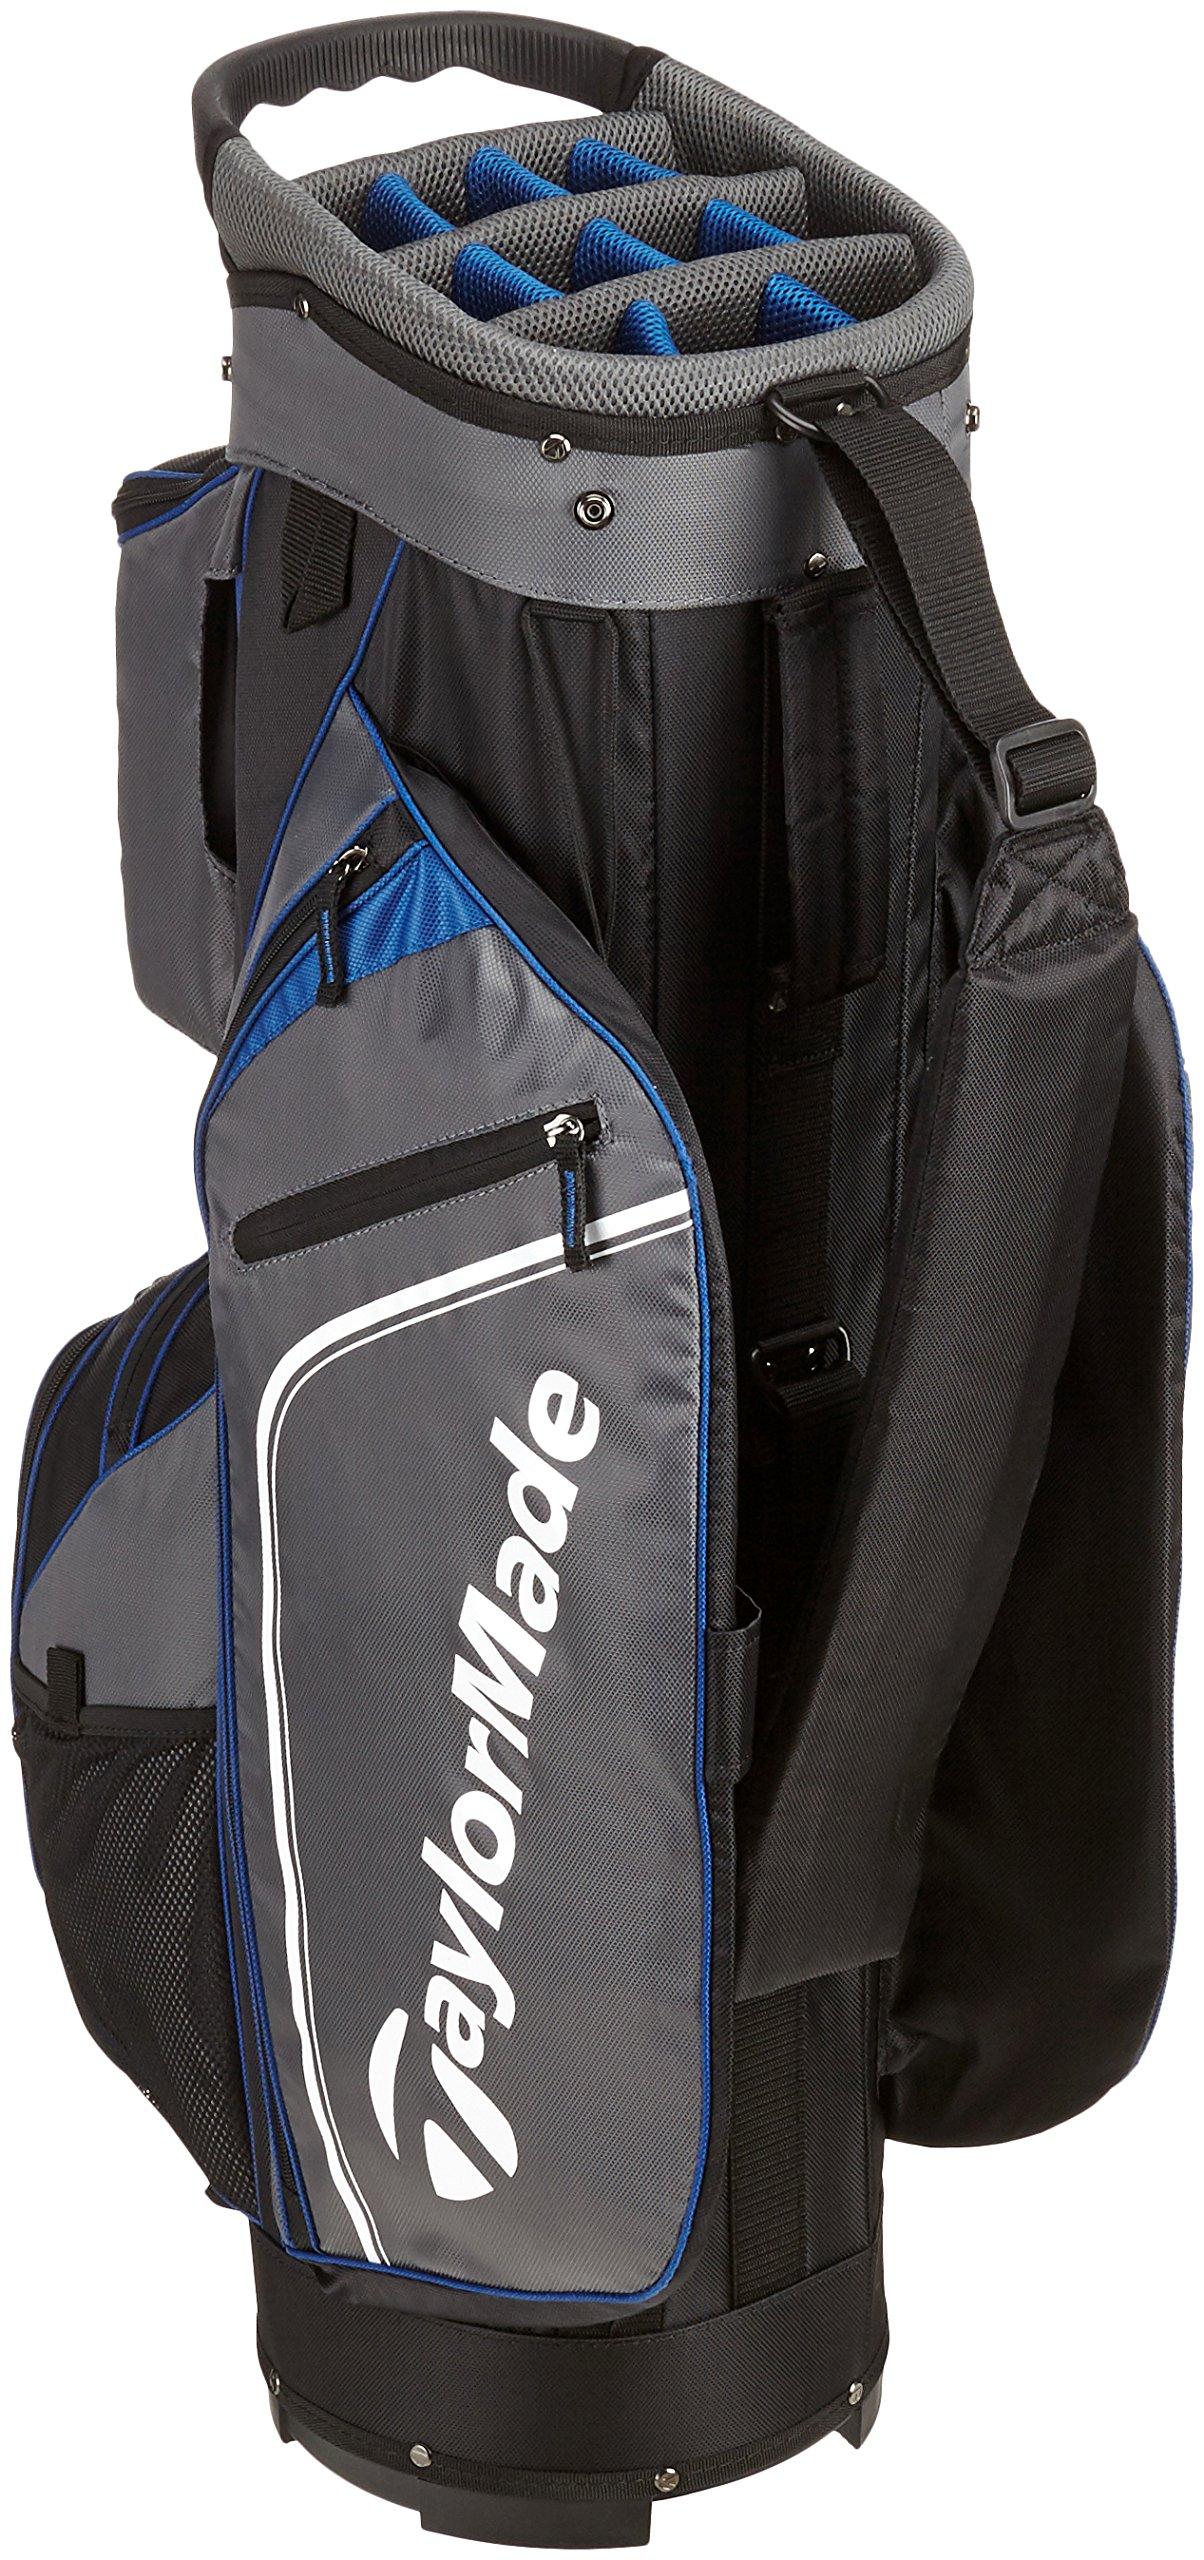 TaylorMade Pro Cart 4.0 Cart Bag 2016 Black/Grey/Blue by TaylorMade (Image #2)